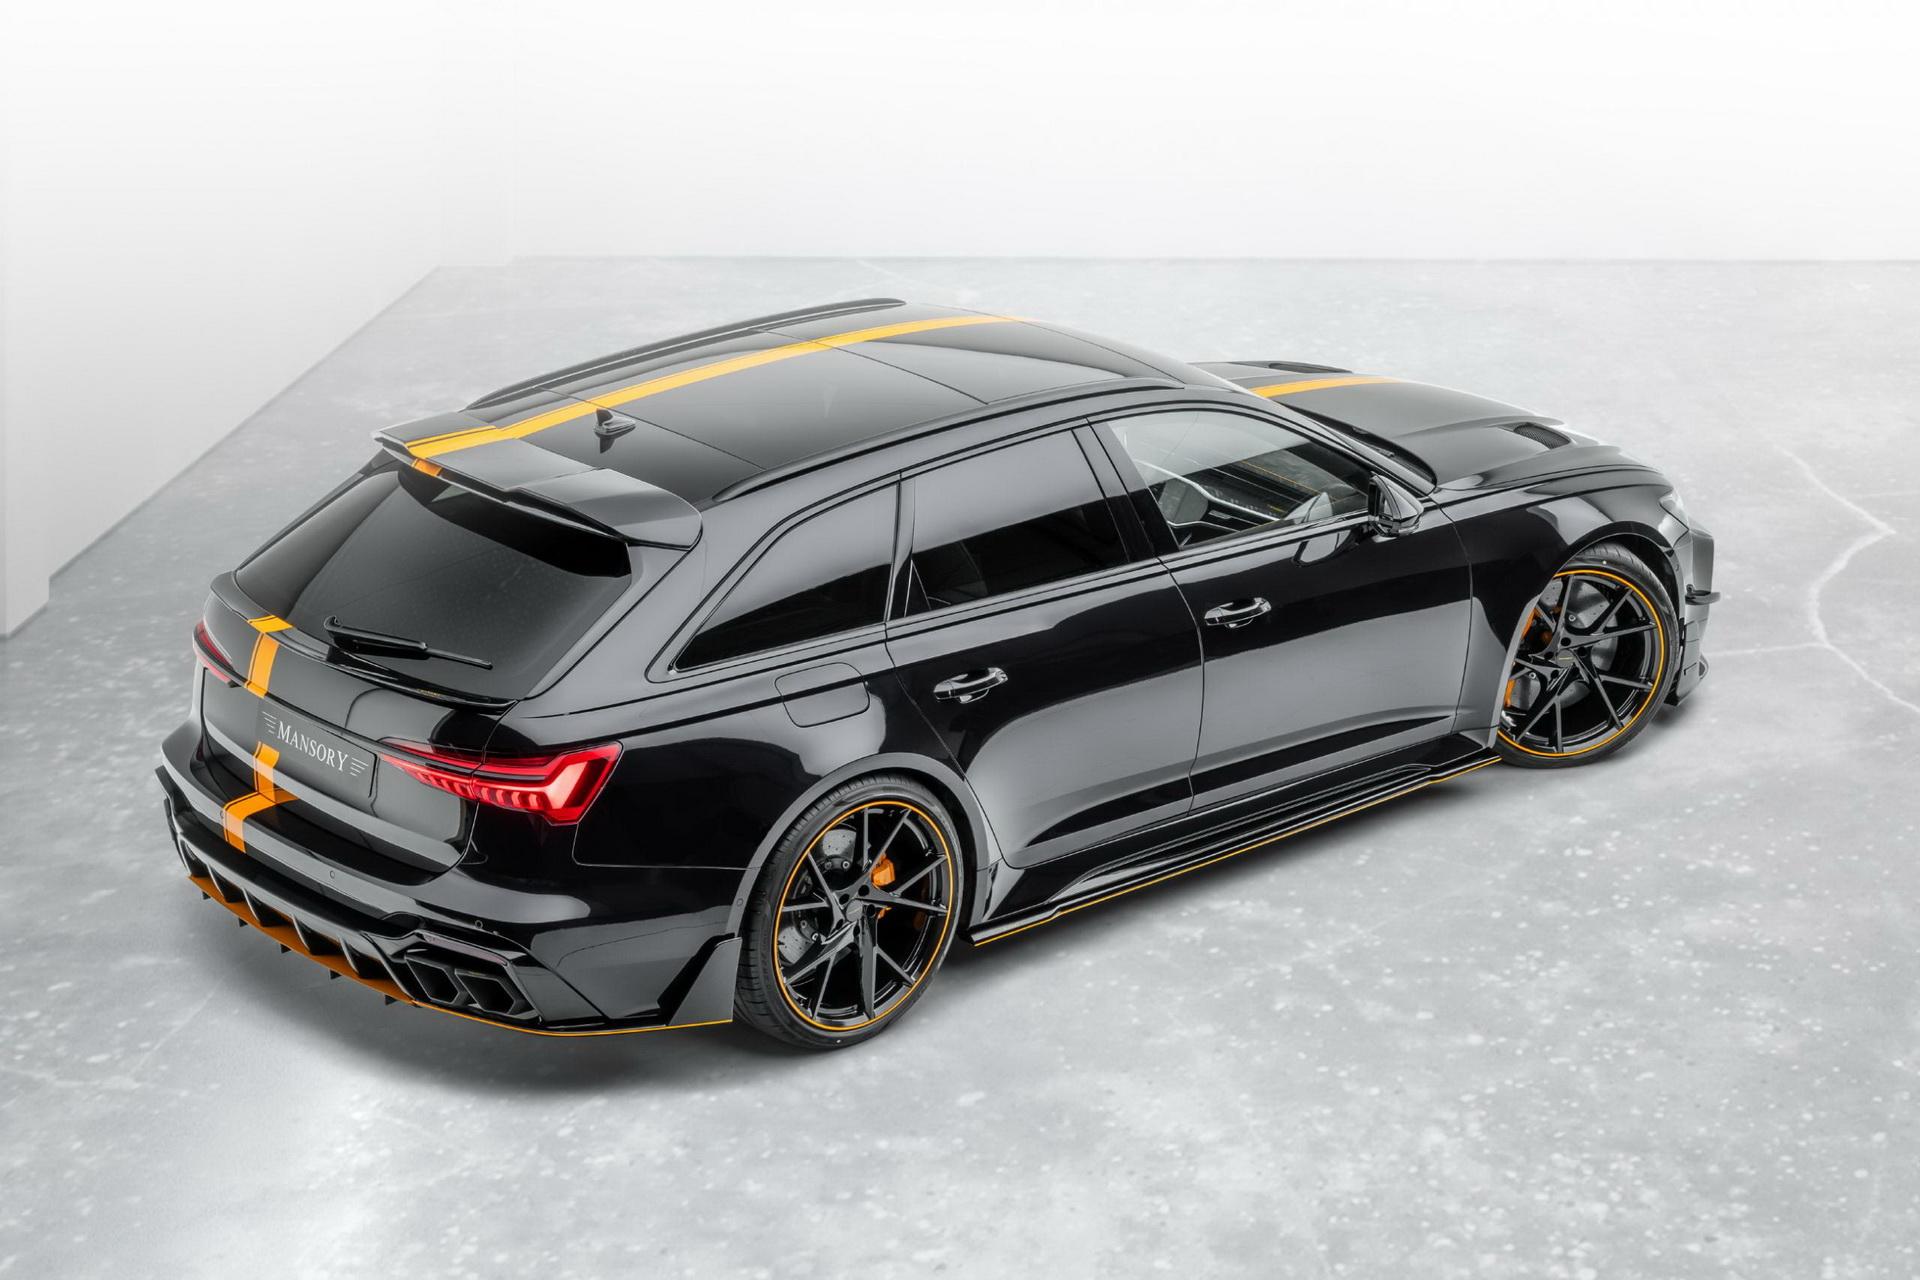 Audi_RS6_Avant_By_Mansory_0006